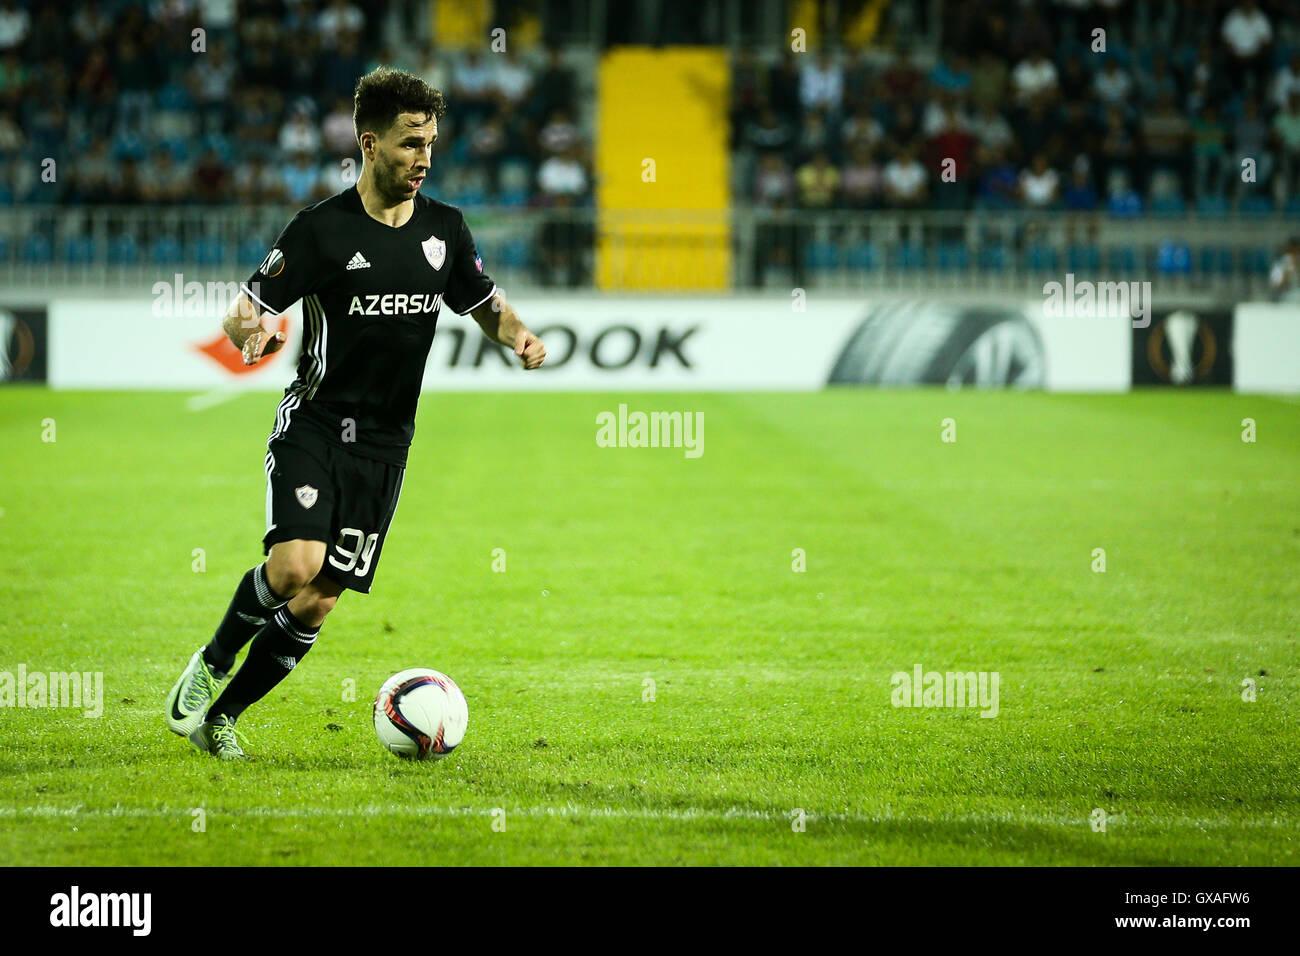 Baku, Azerbaijan. 15th Sep, 2016. Qarabag FK's player Dani Quintana controls the ball during the UEFA Europe League Stock Photo